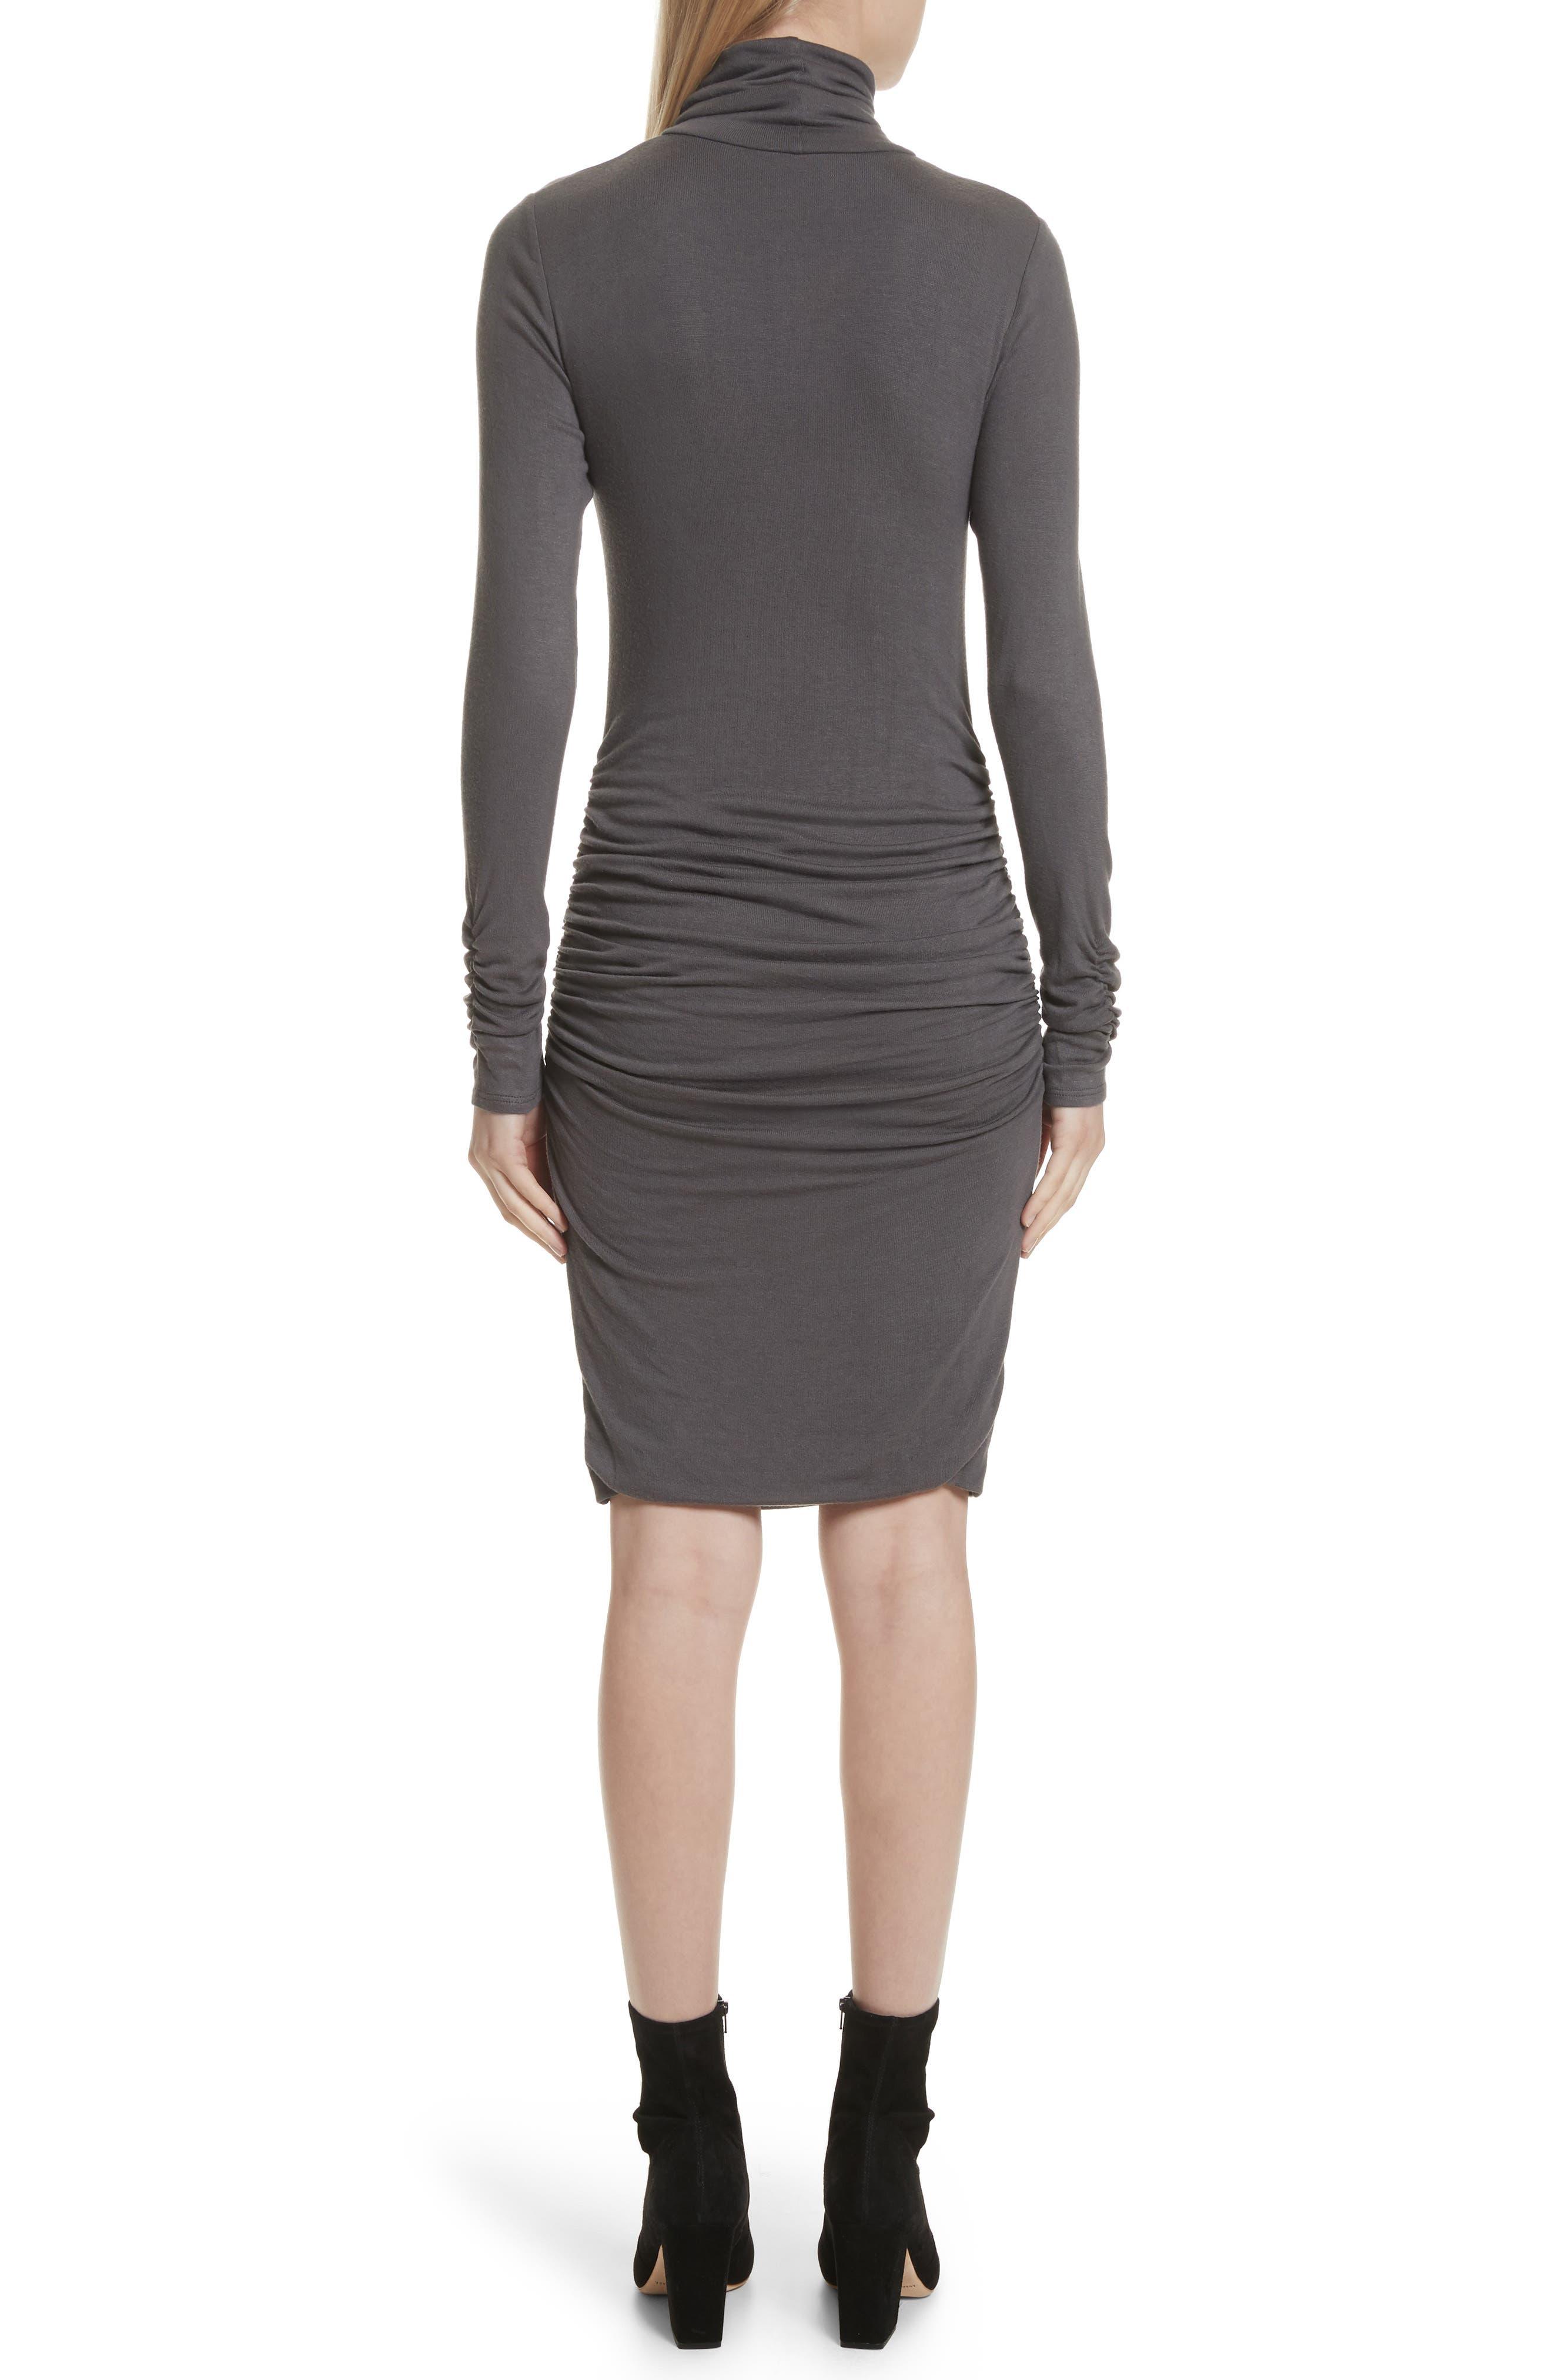 TWENTY,                             Body-Con Turtleneck Dress,                             Alternate thumbnail 2, color,                             021